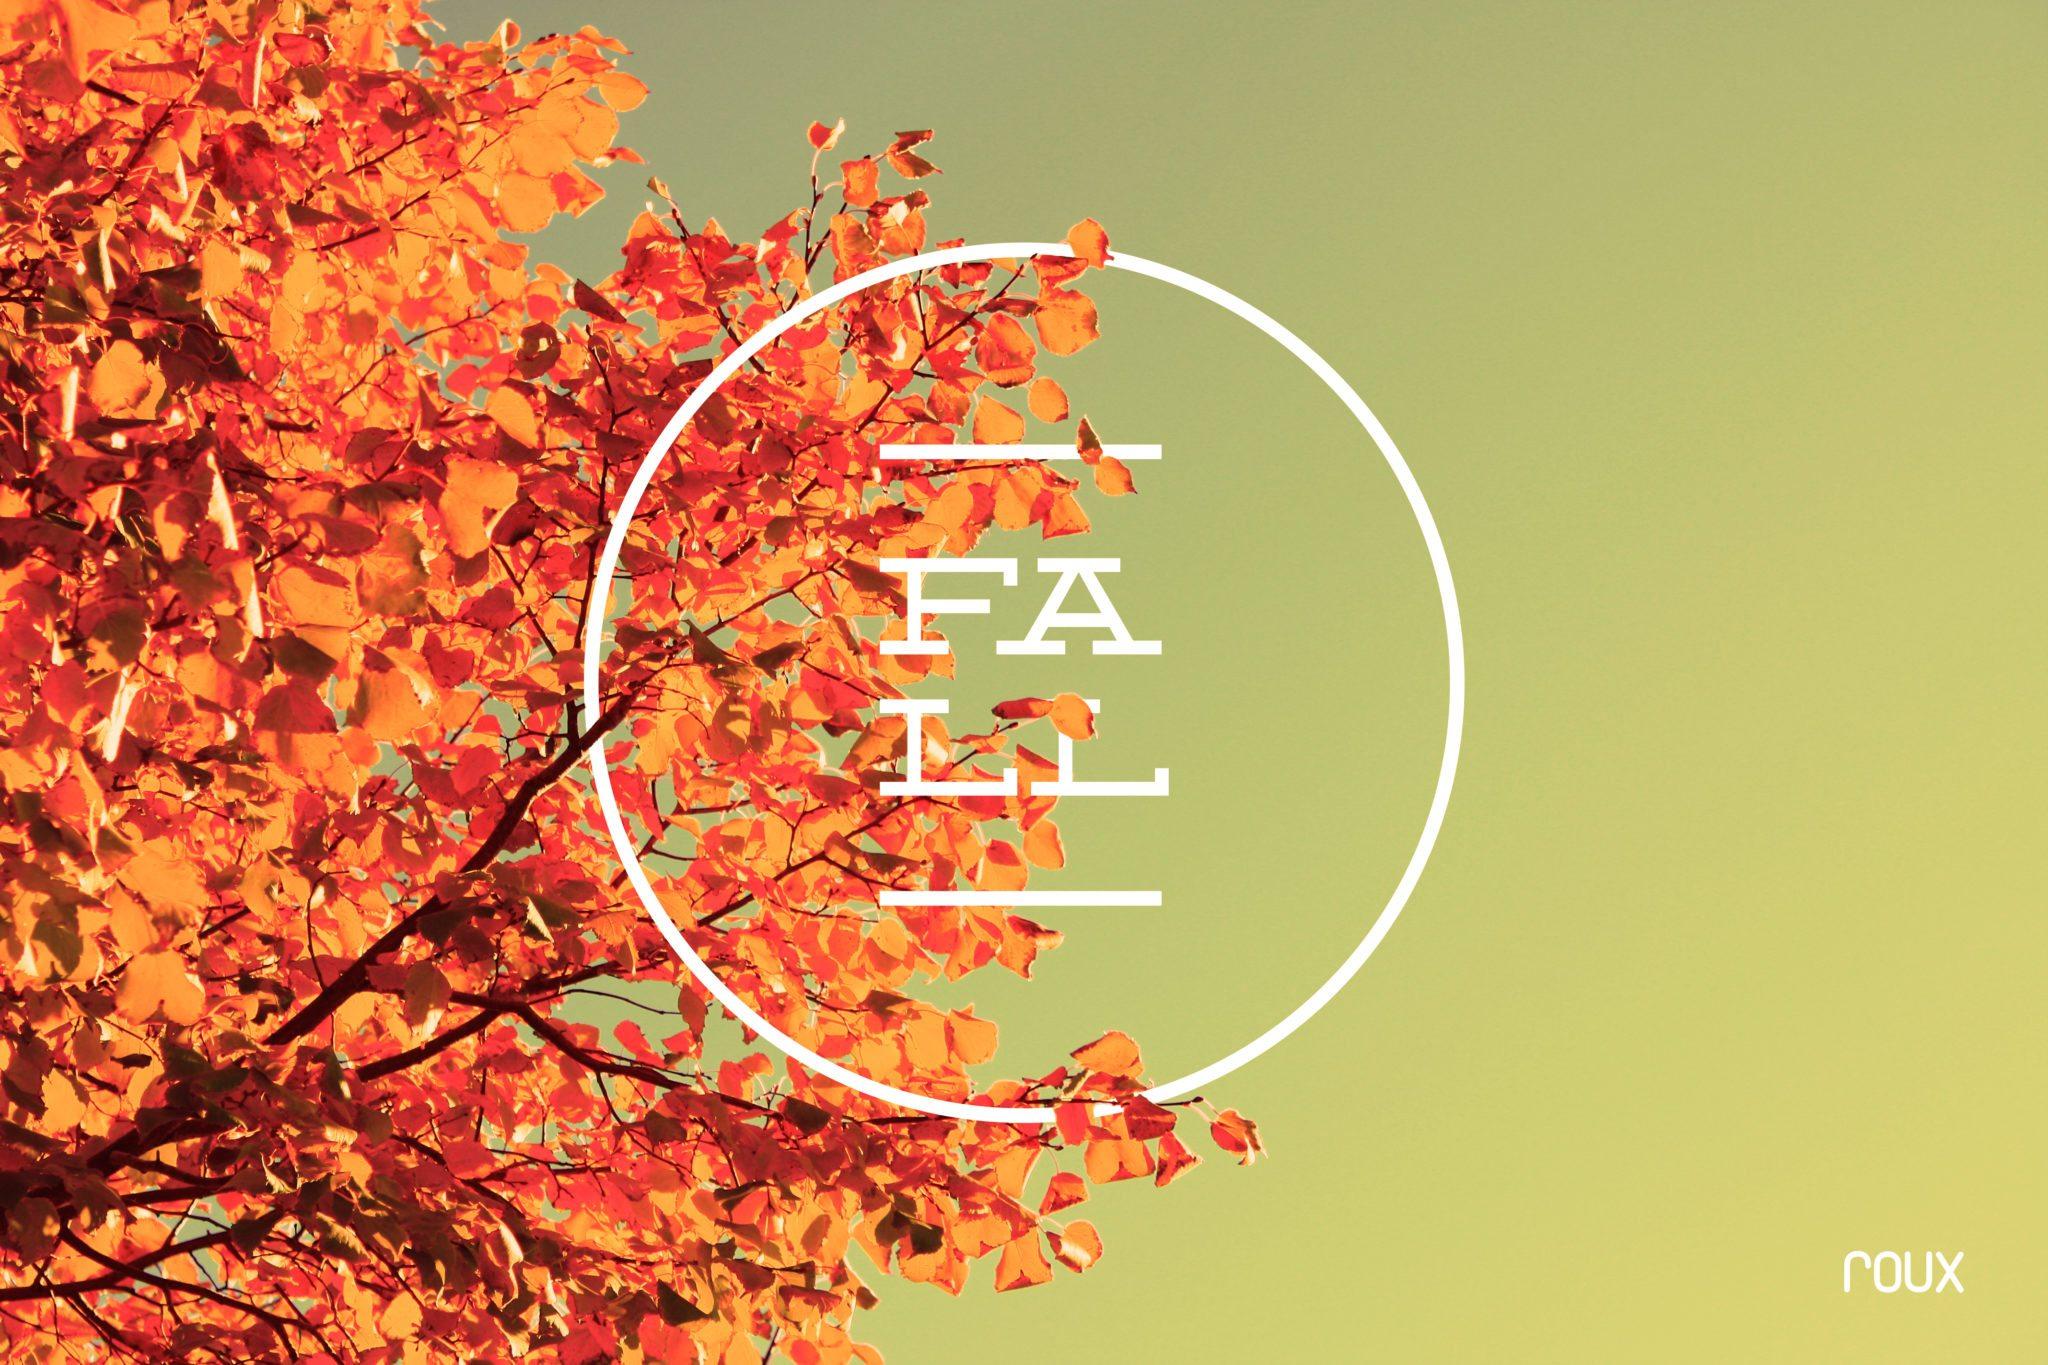 Fall Wallpaper Roux 2048x1365